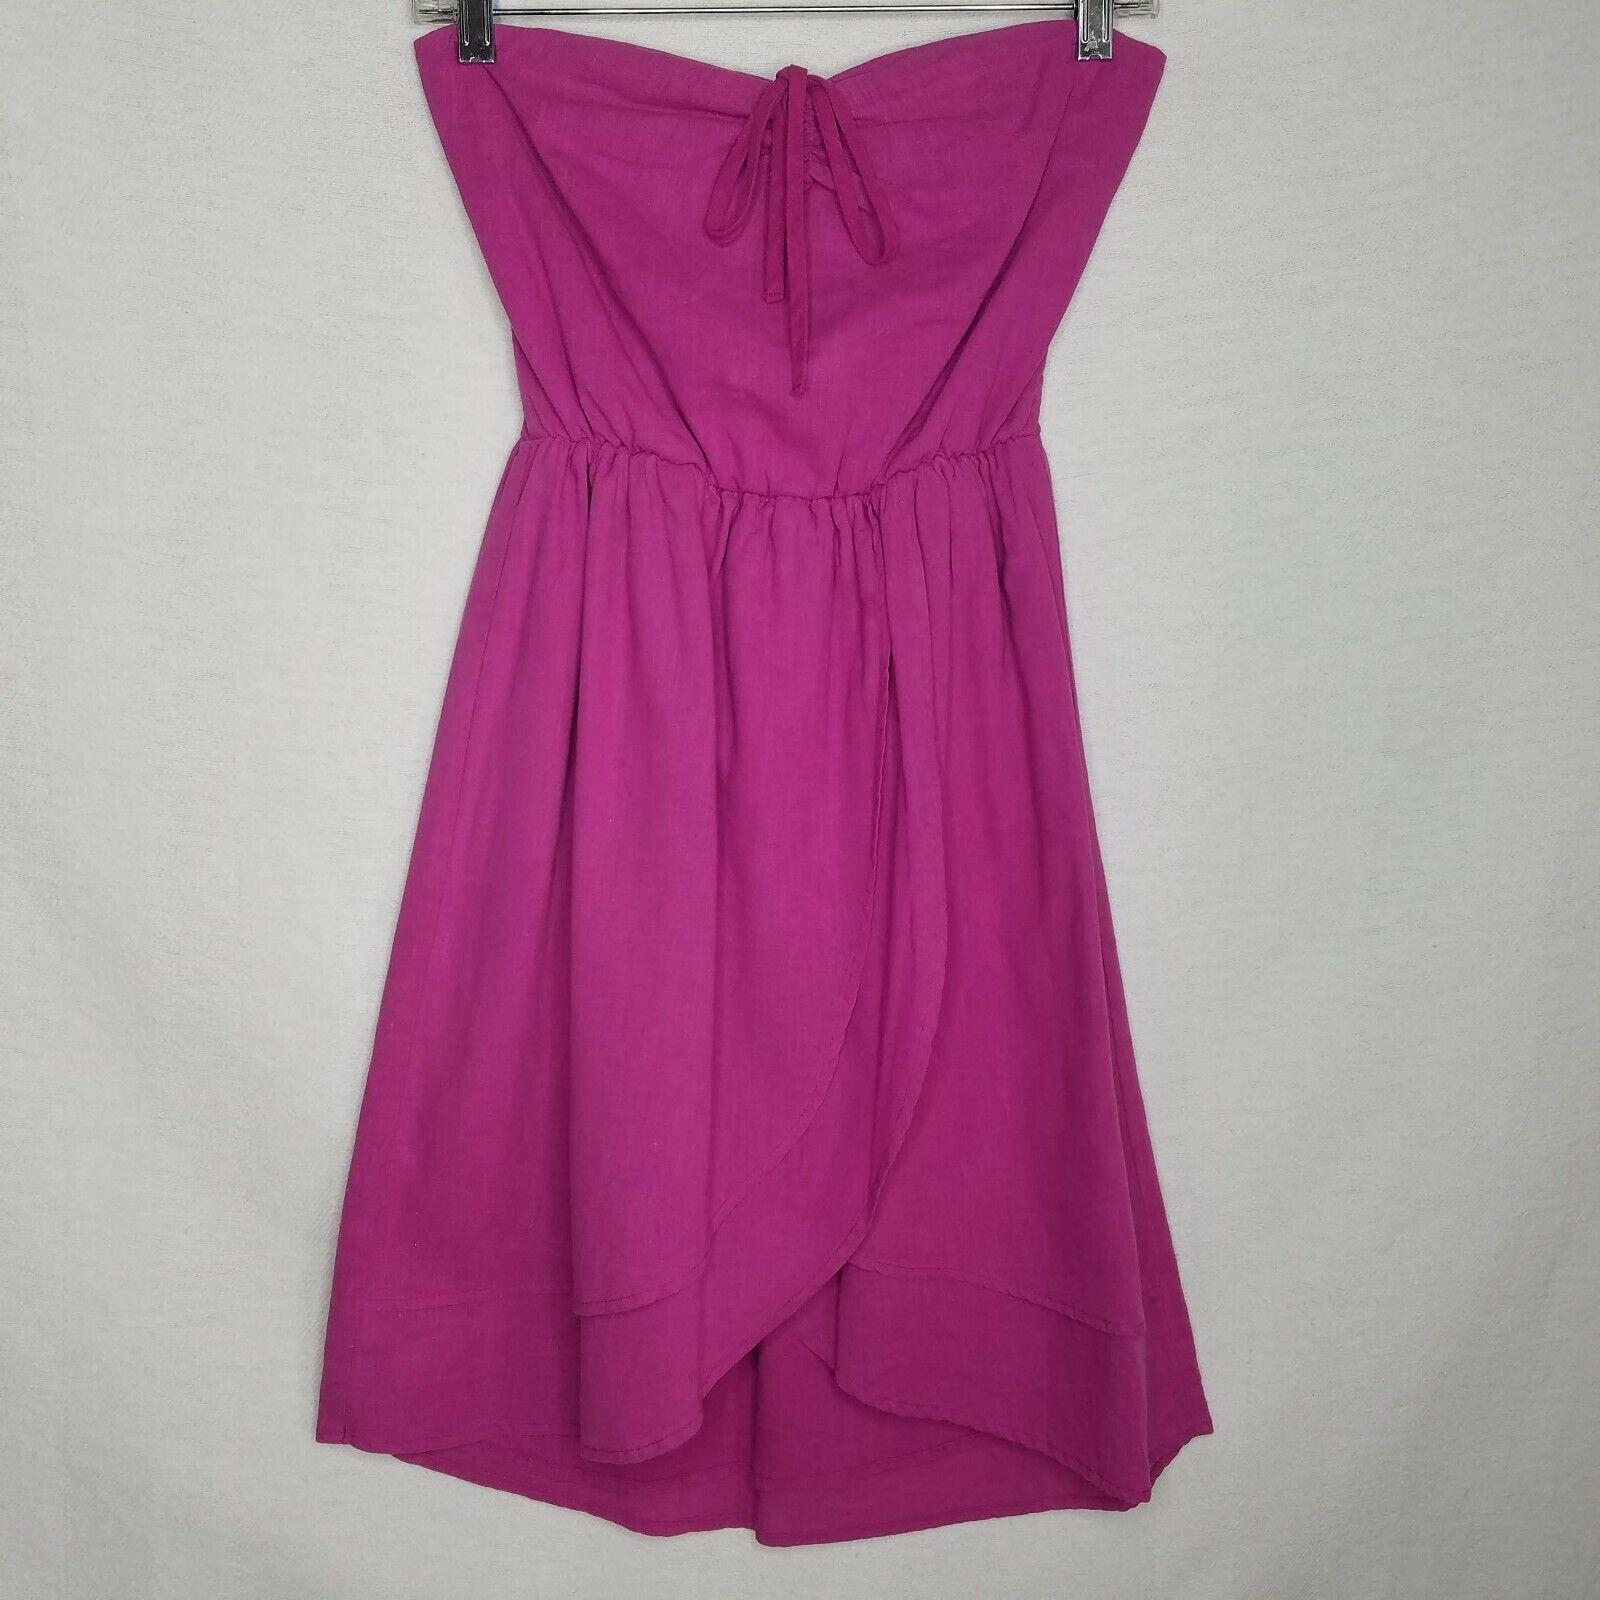 Patterson J Kincaid Strapless Overlap Dress Linen Blend Pink Size Small A406P